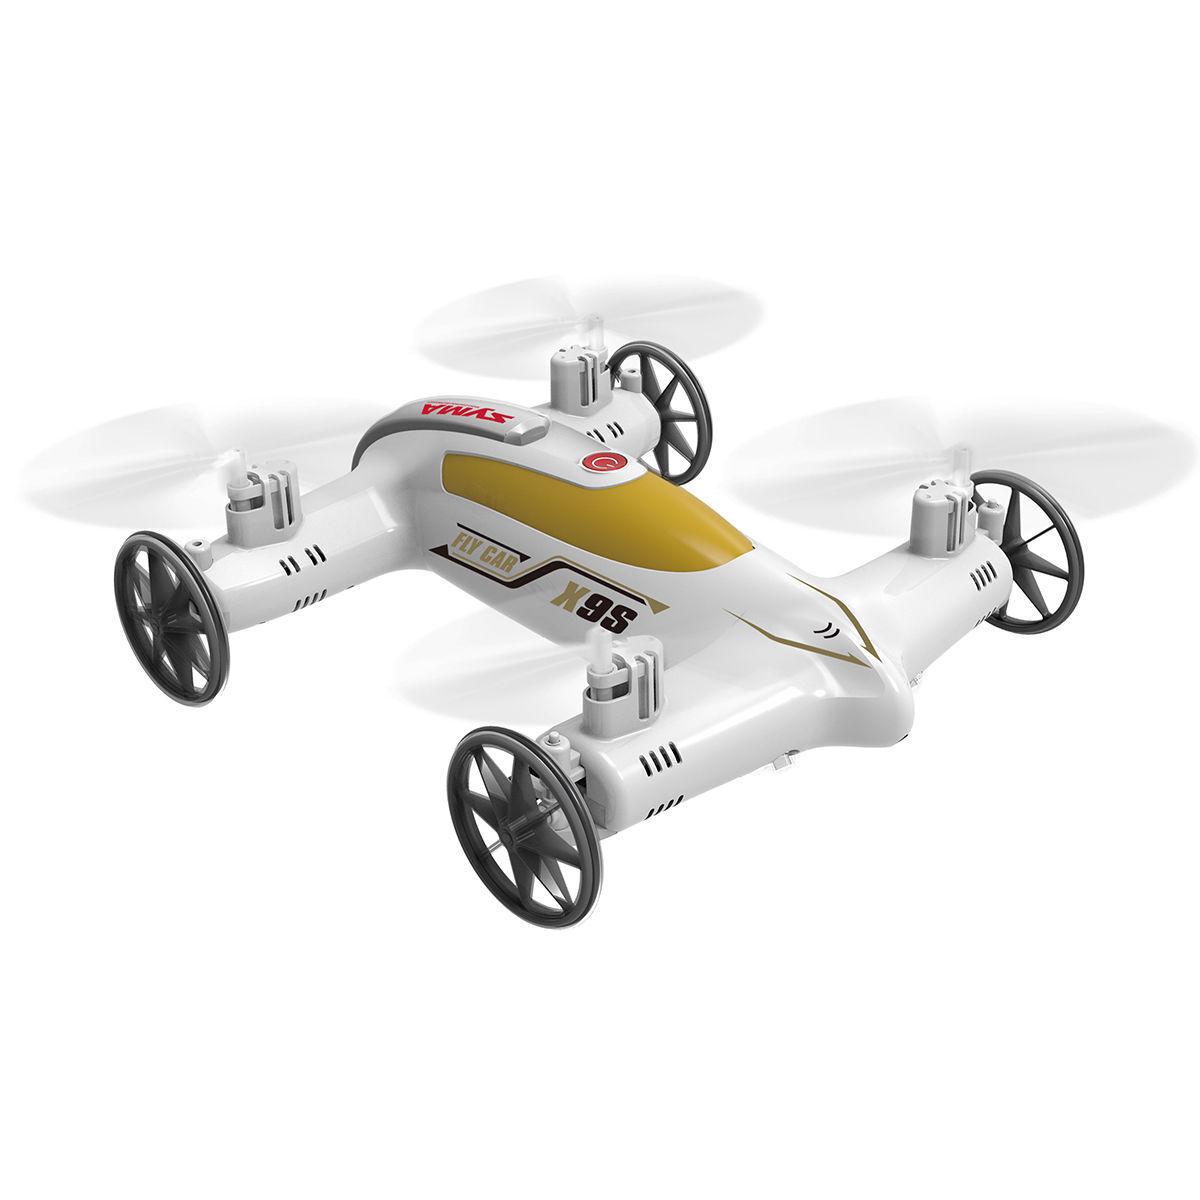 Rc Led Light Wiring Kit 9v Connector Fpv Quadcopter Rc Plane Car Truck